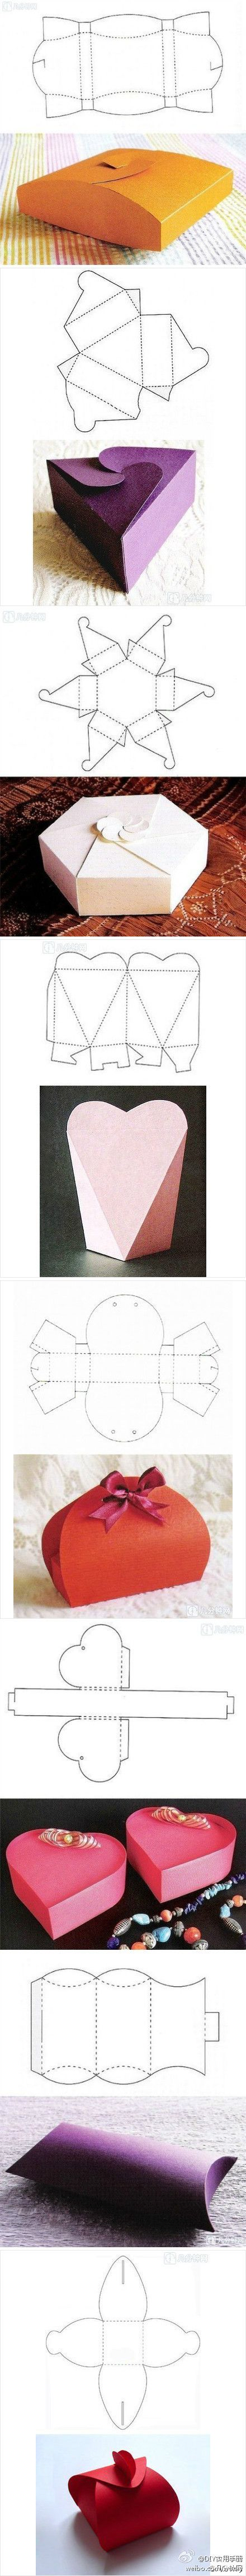 Коробочки для подарков сделано руками 337